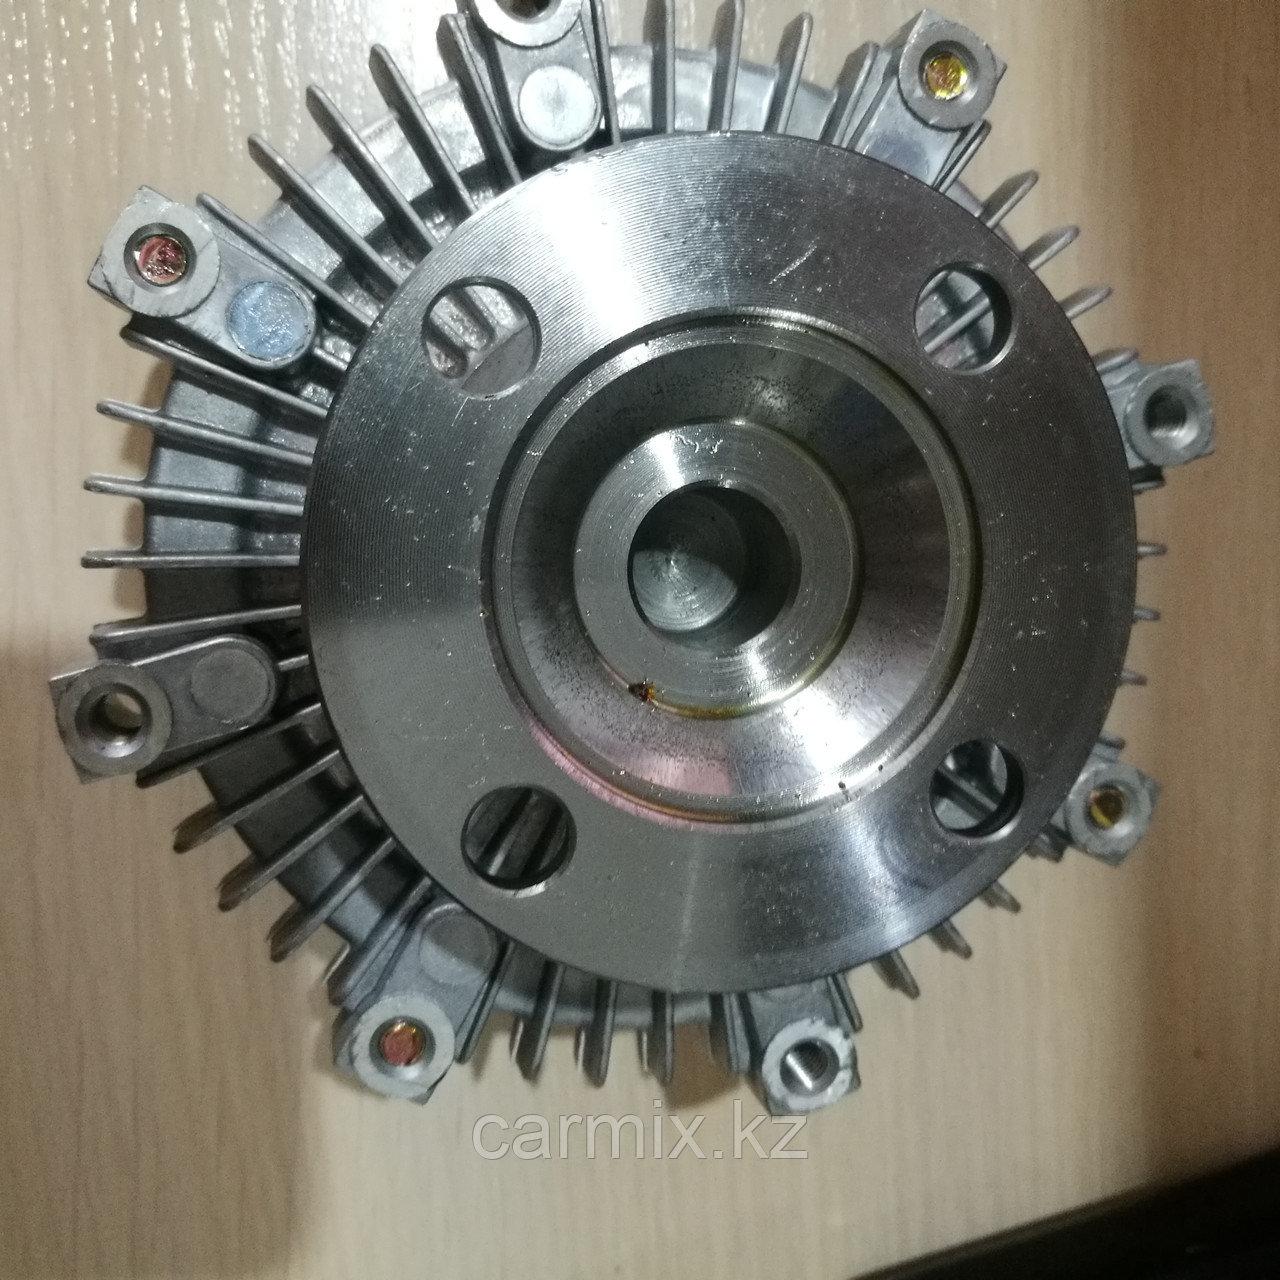 Гидромуфта (термо муфта)  HIACE RZH115